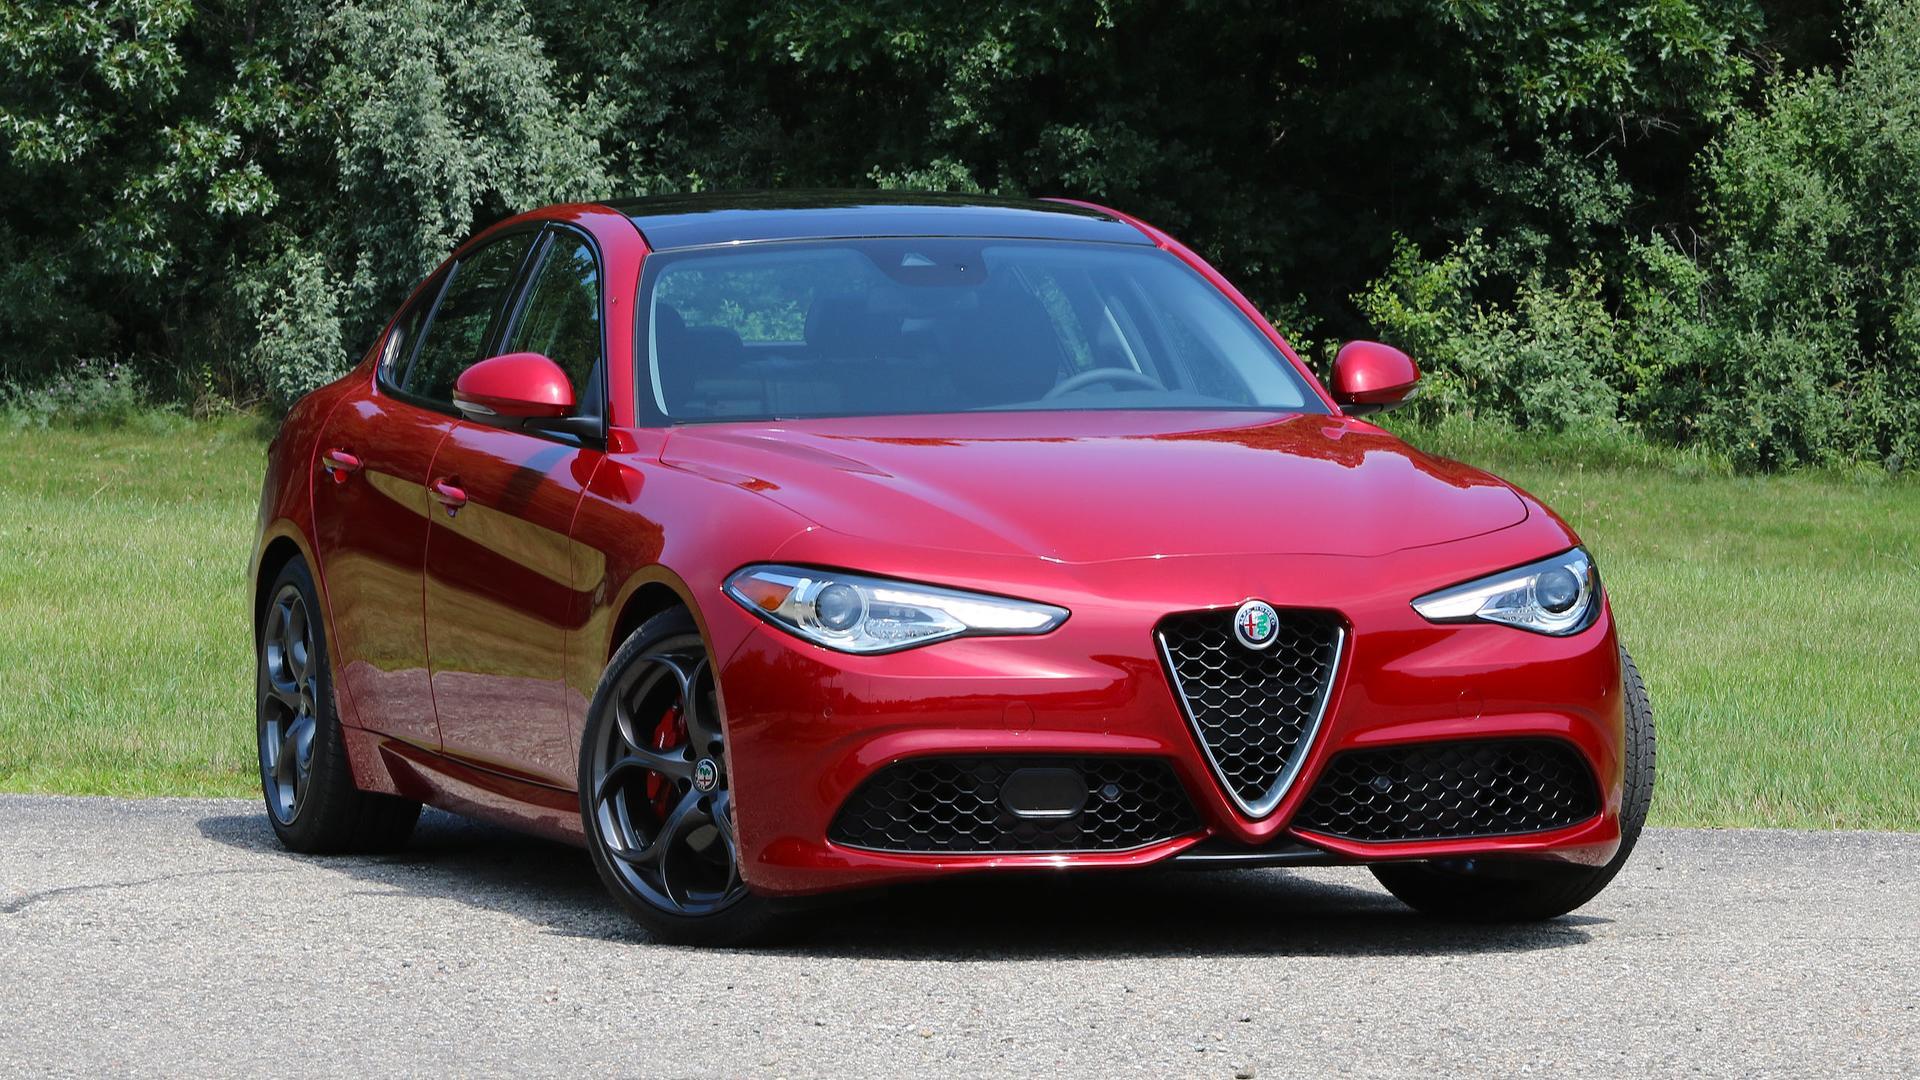 Alfa Romeo Giulia Likely Getting 350-Horsepower Engine